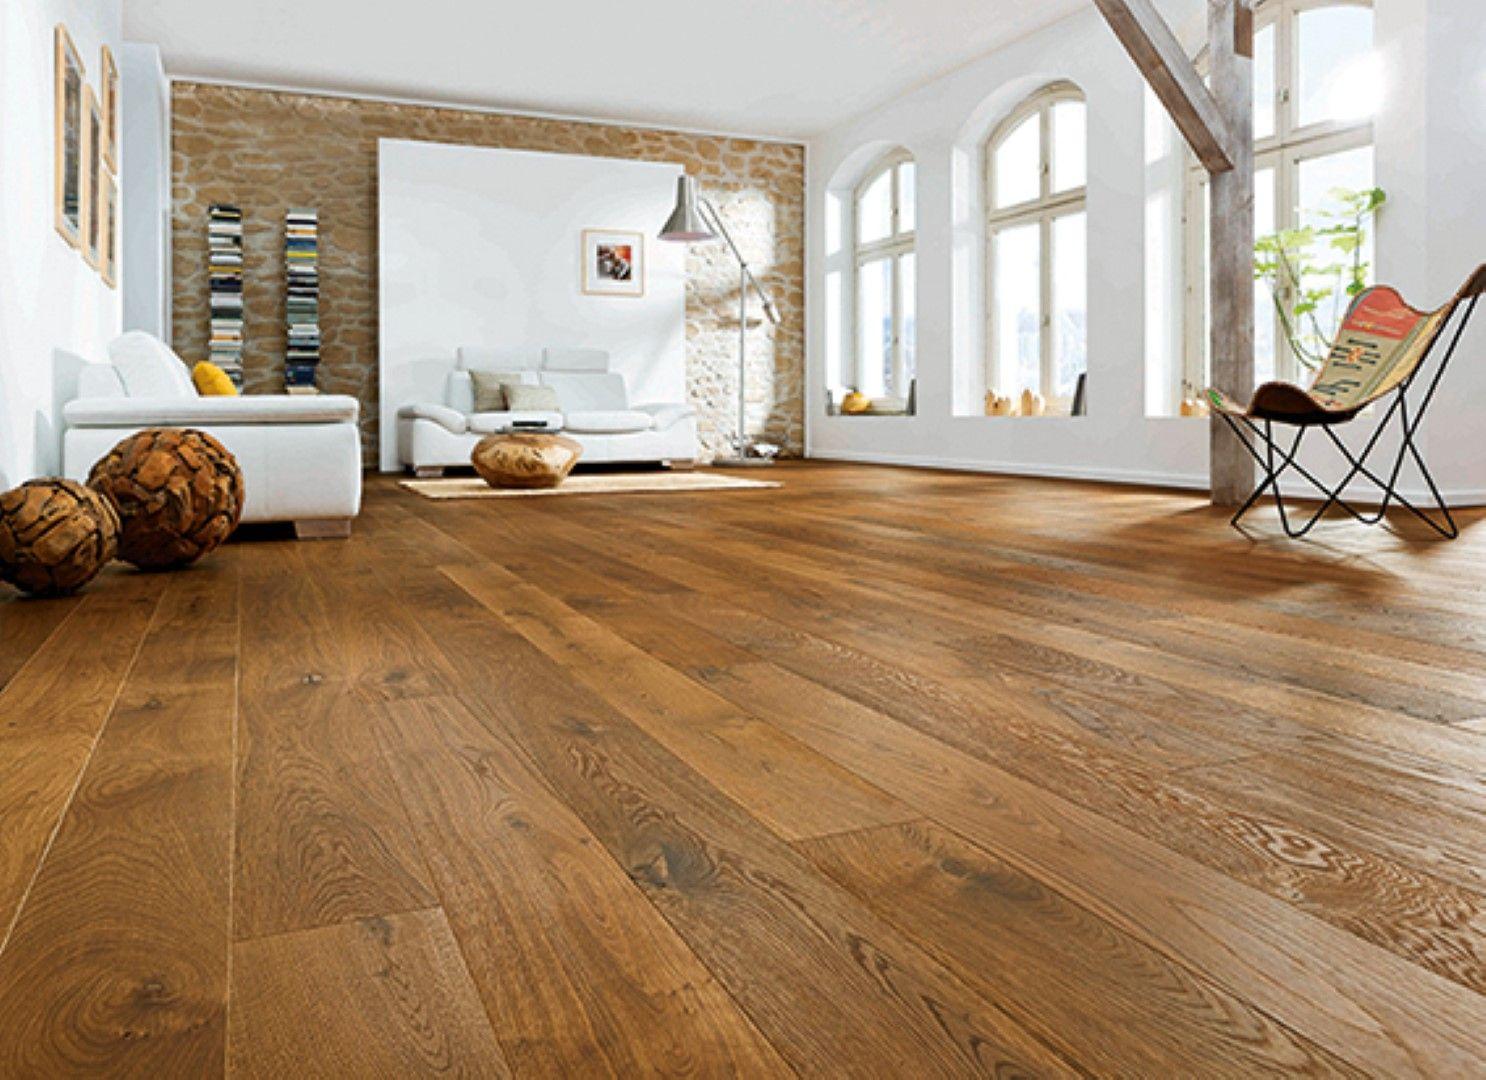 Tech Tiles Parquet Flooring Flooring House Flooring